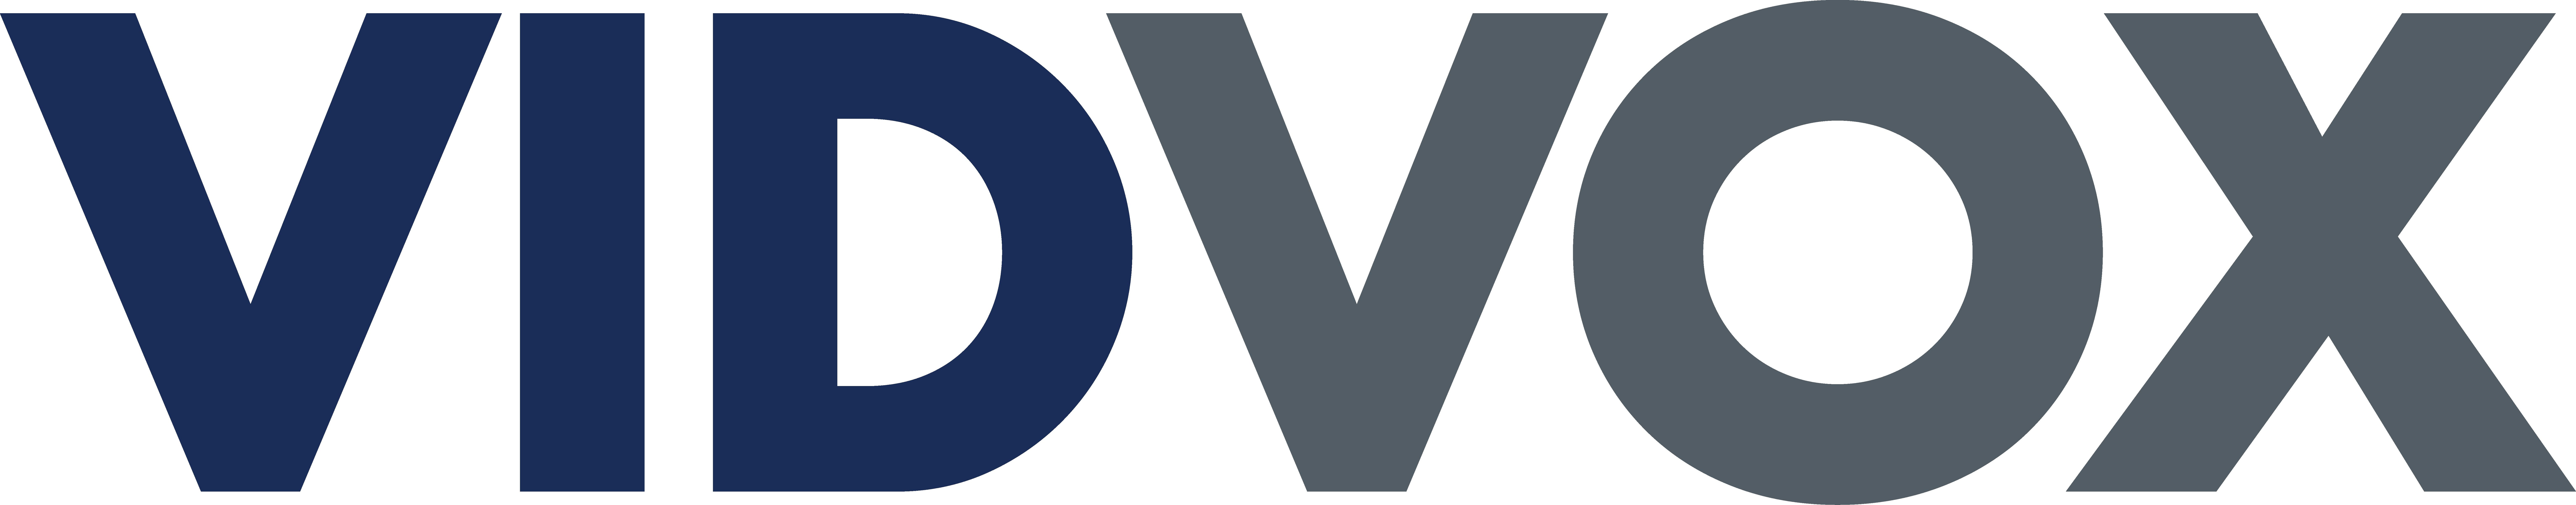 VIDVOX